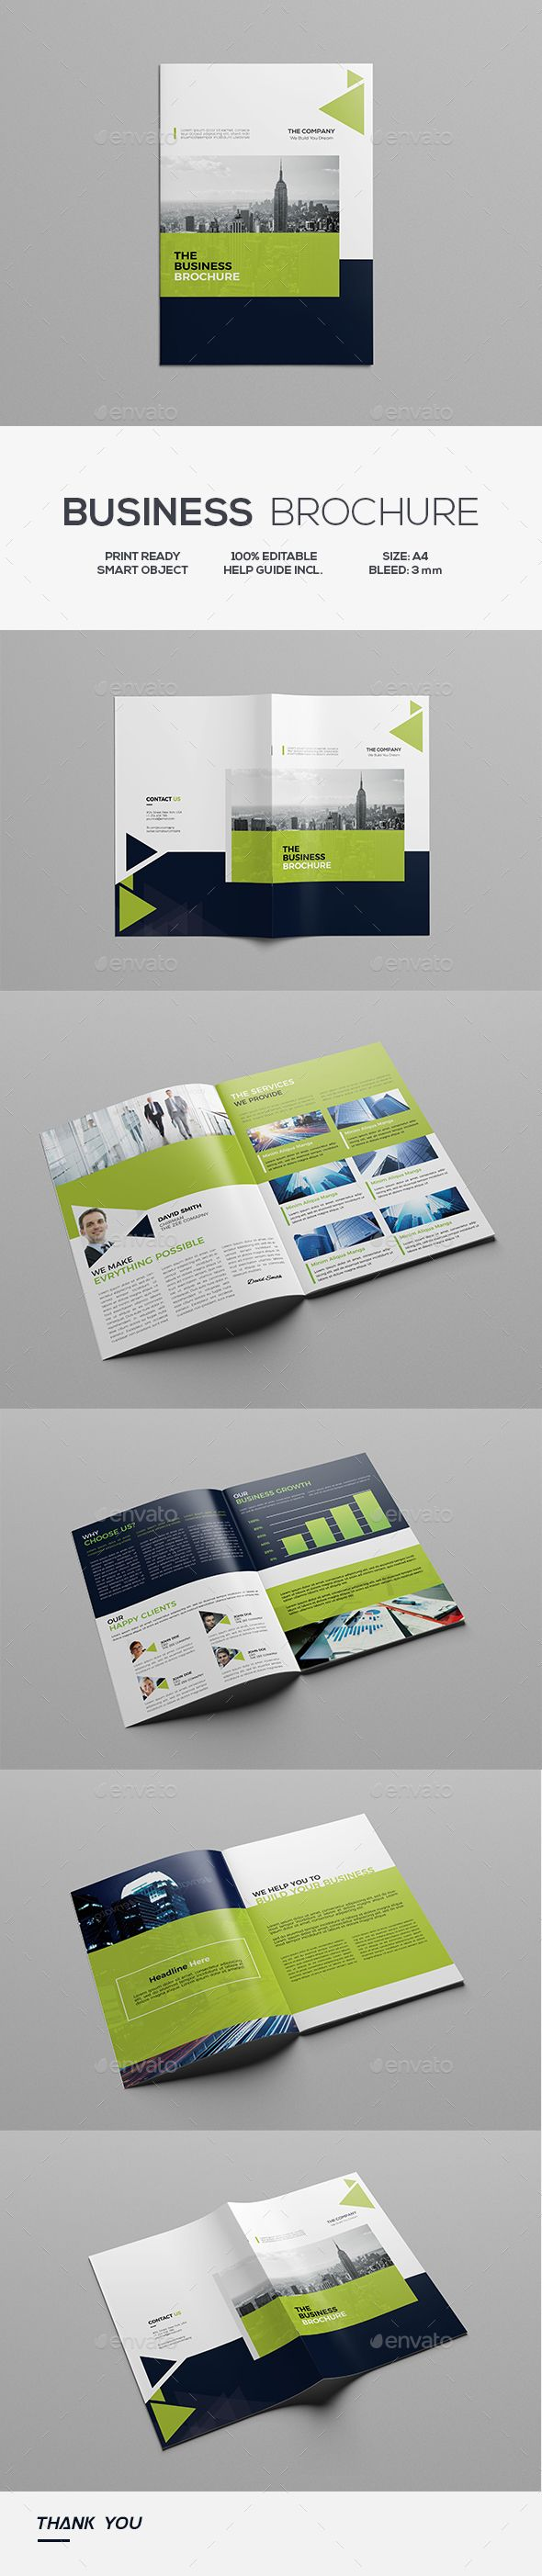 Business Brochure — Photoshop PSD #promotion #elegant • Download ➝ https://graphicriver.net/item/business-brochure/19273165?ref=pxcr